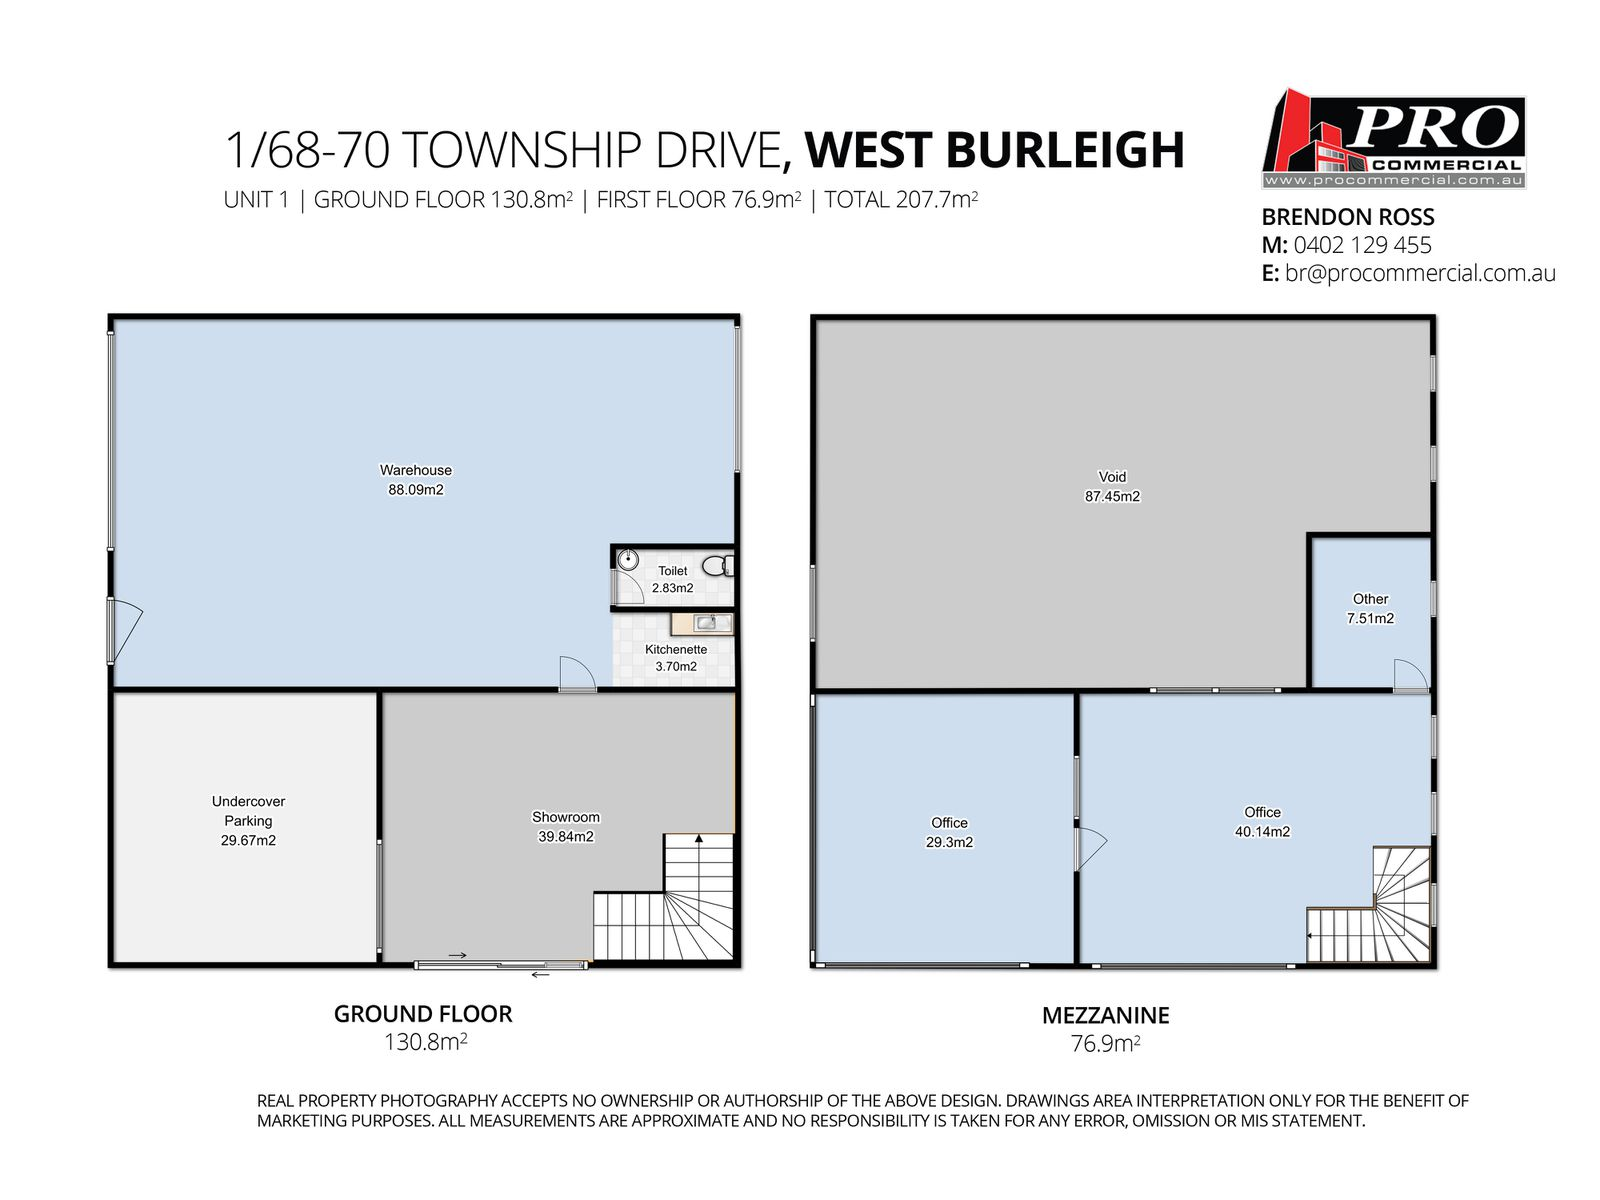 1 / 68-70 Township Drive, Burleigh Heads